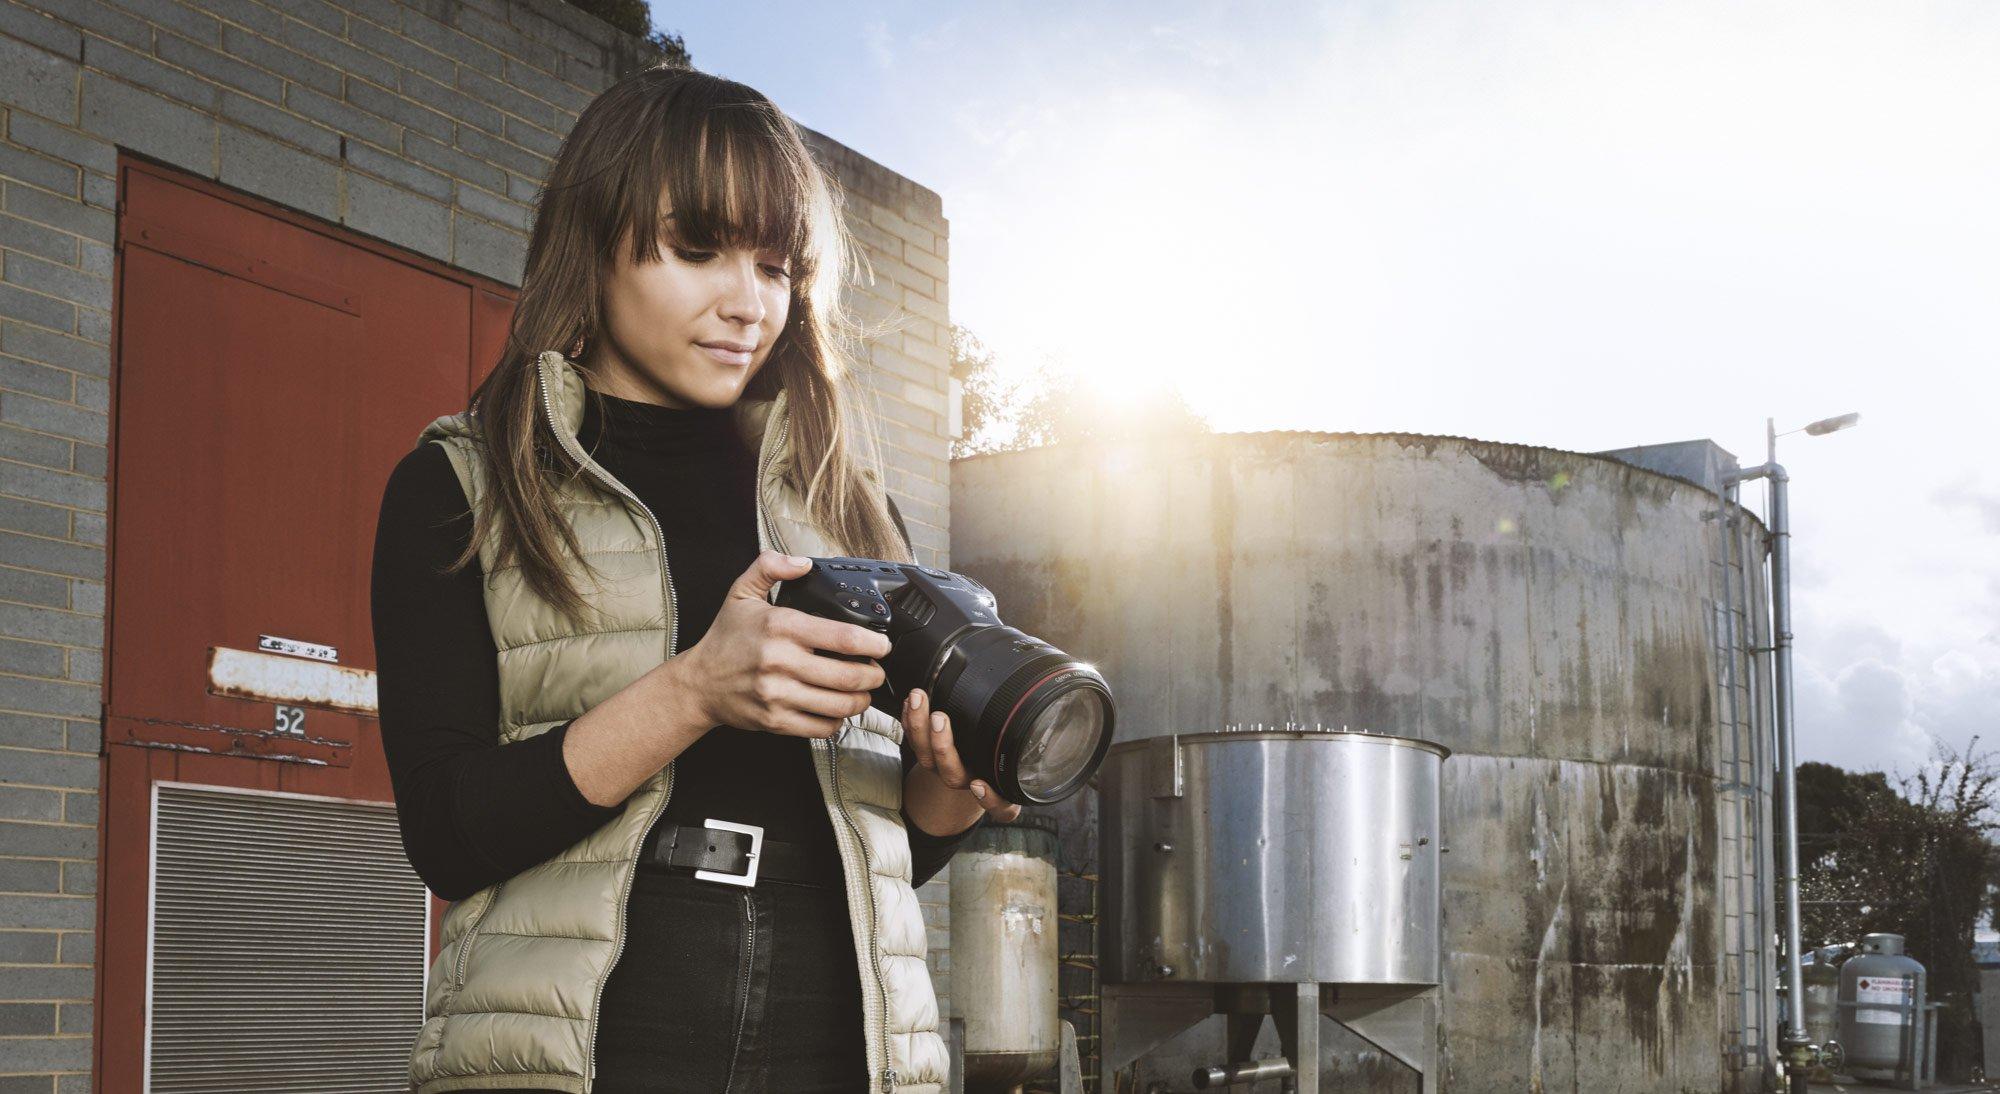 Blackmagic Pocket Cinema Camera 6K Uses Bigger Sensor & Canon EF Mount